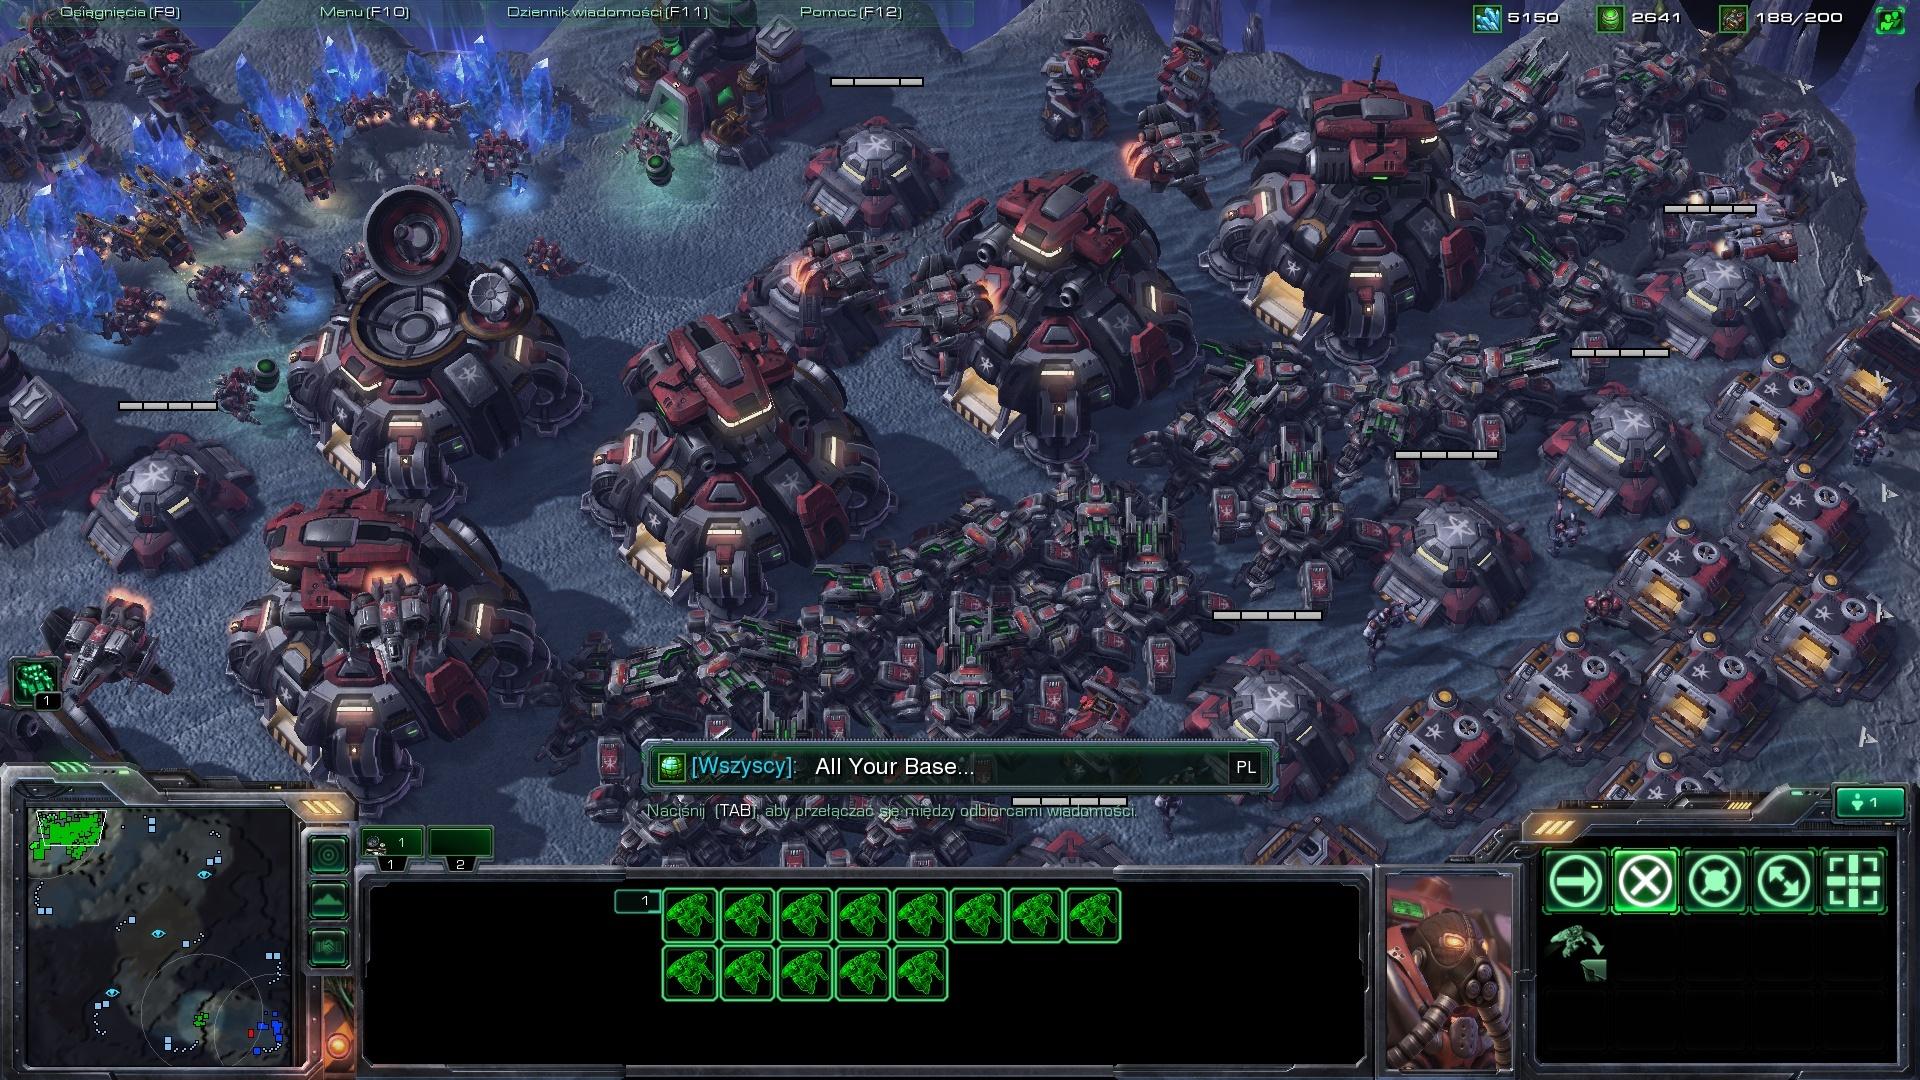 Blizzard Lead Game Designer